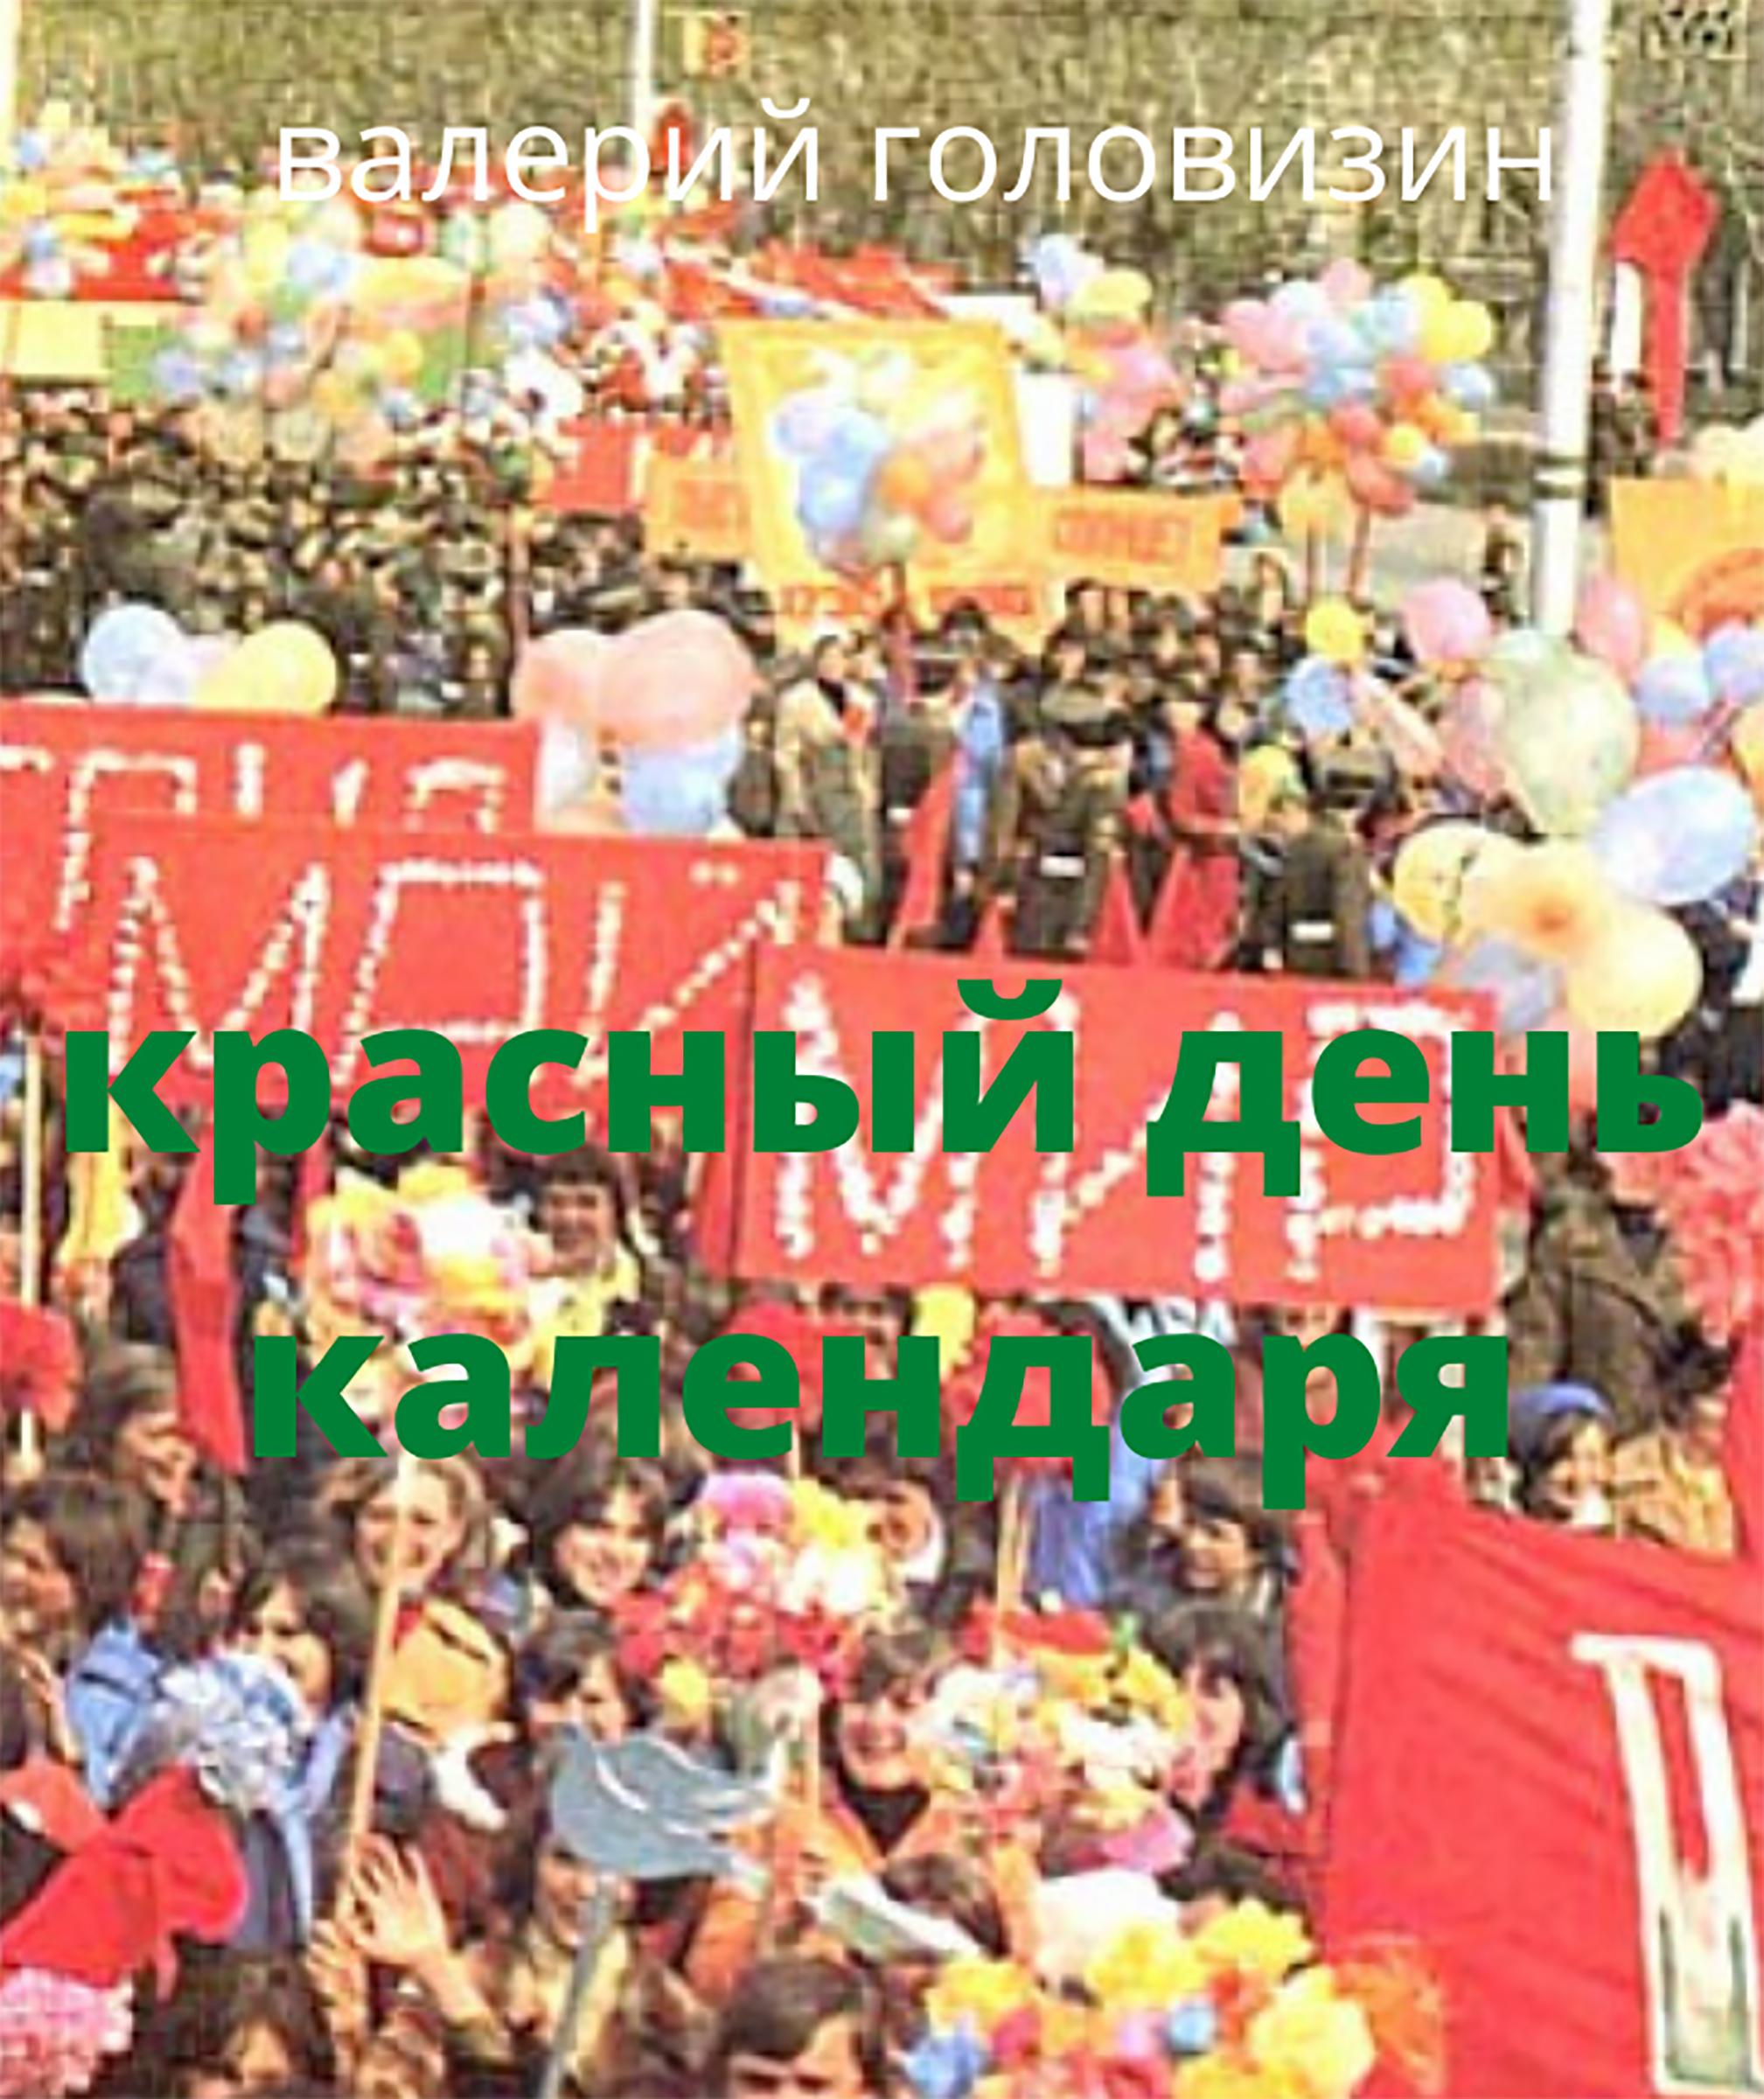 Валерий Викторович Головизин Красный день календаря Фантастика